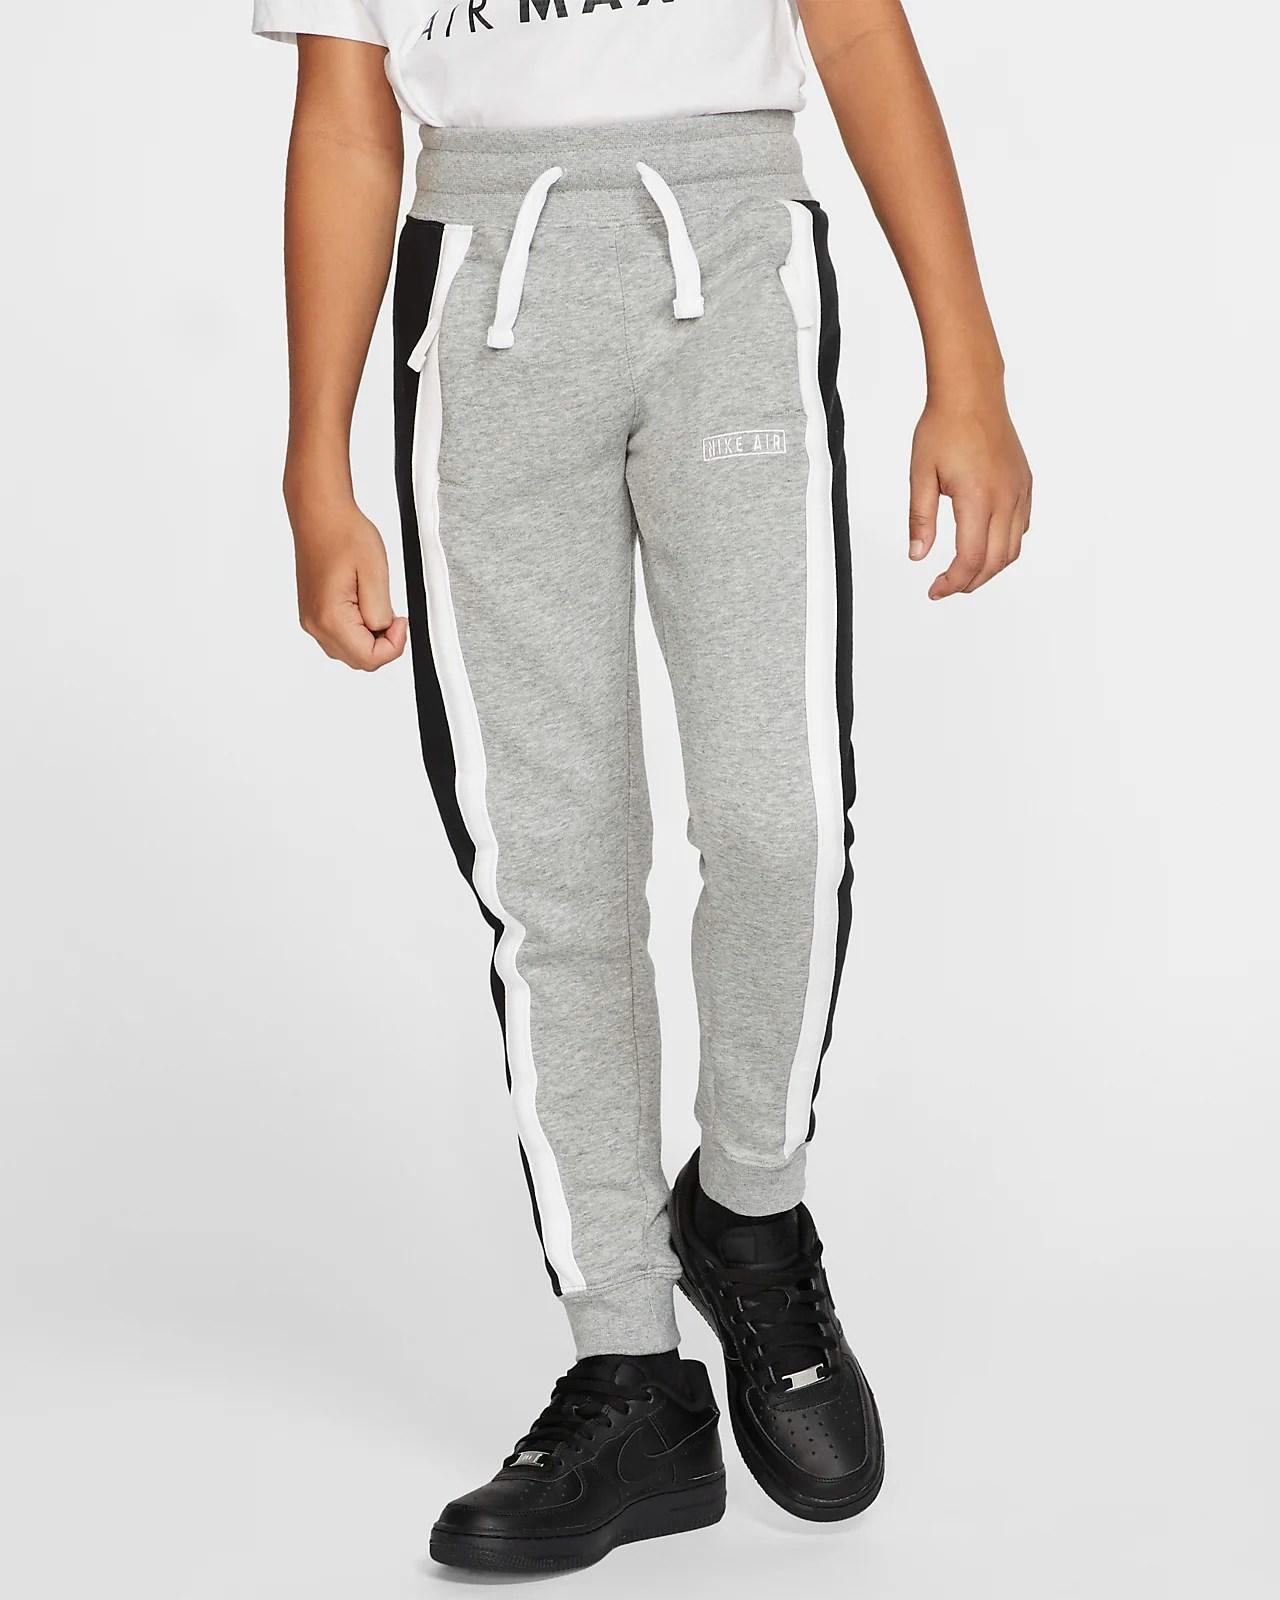 Nike Jogginghose Jungen Schwarz